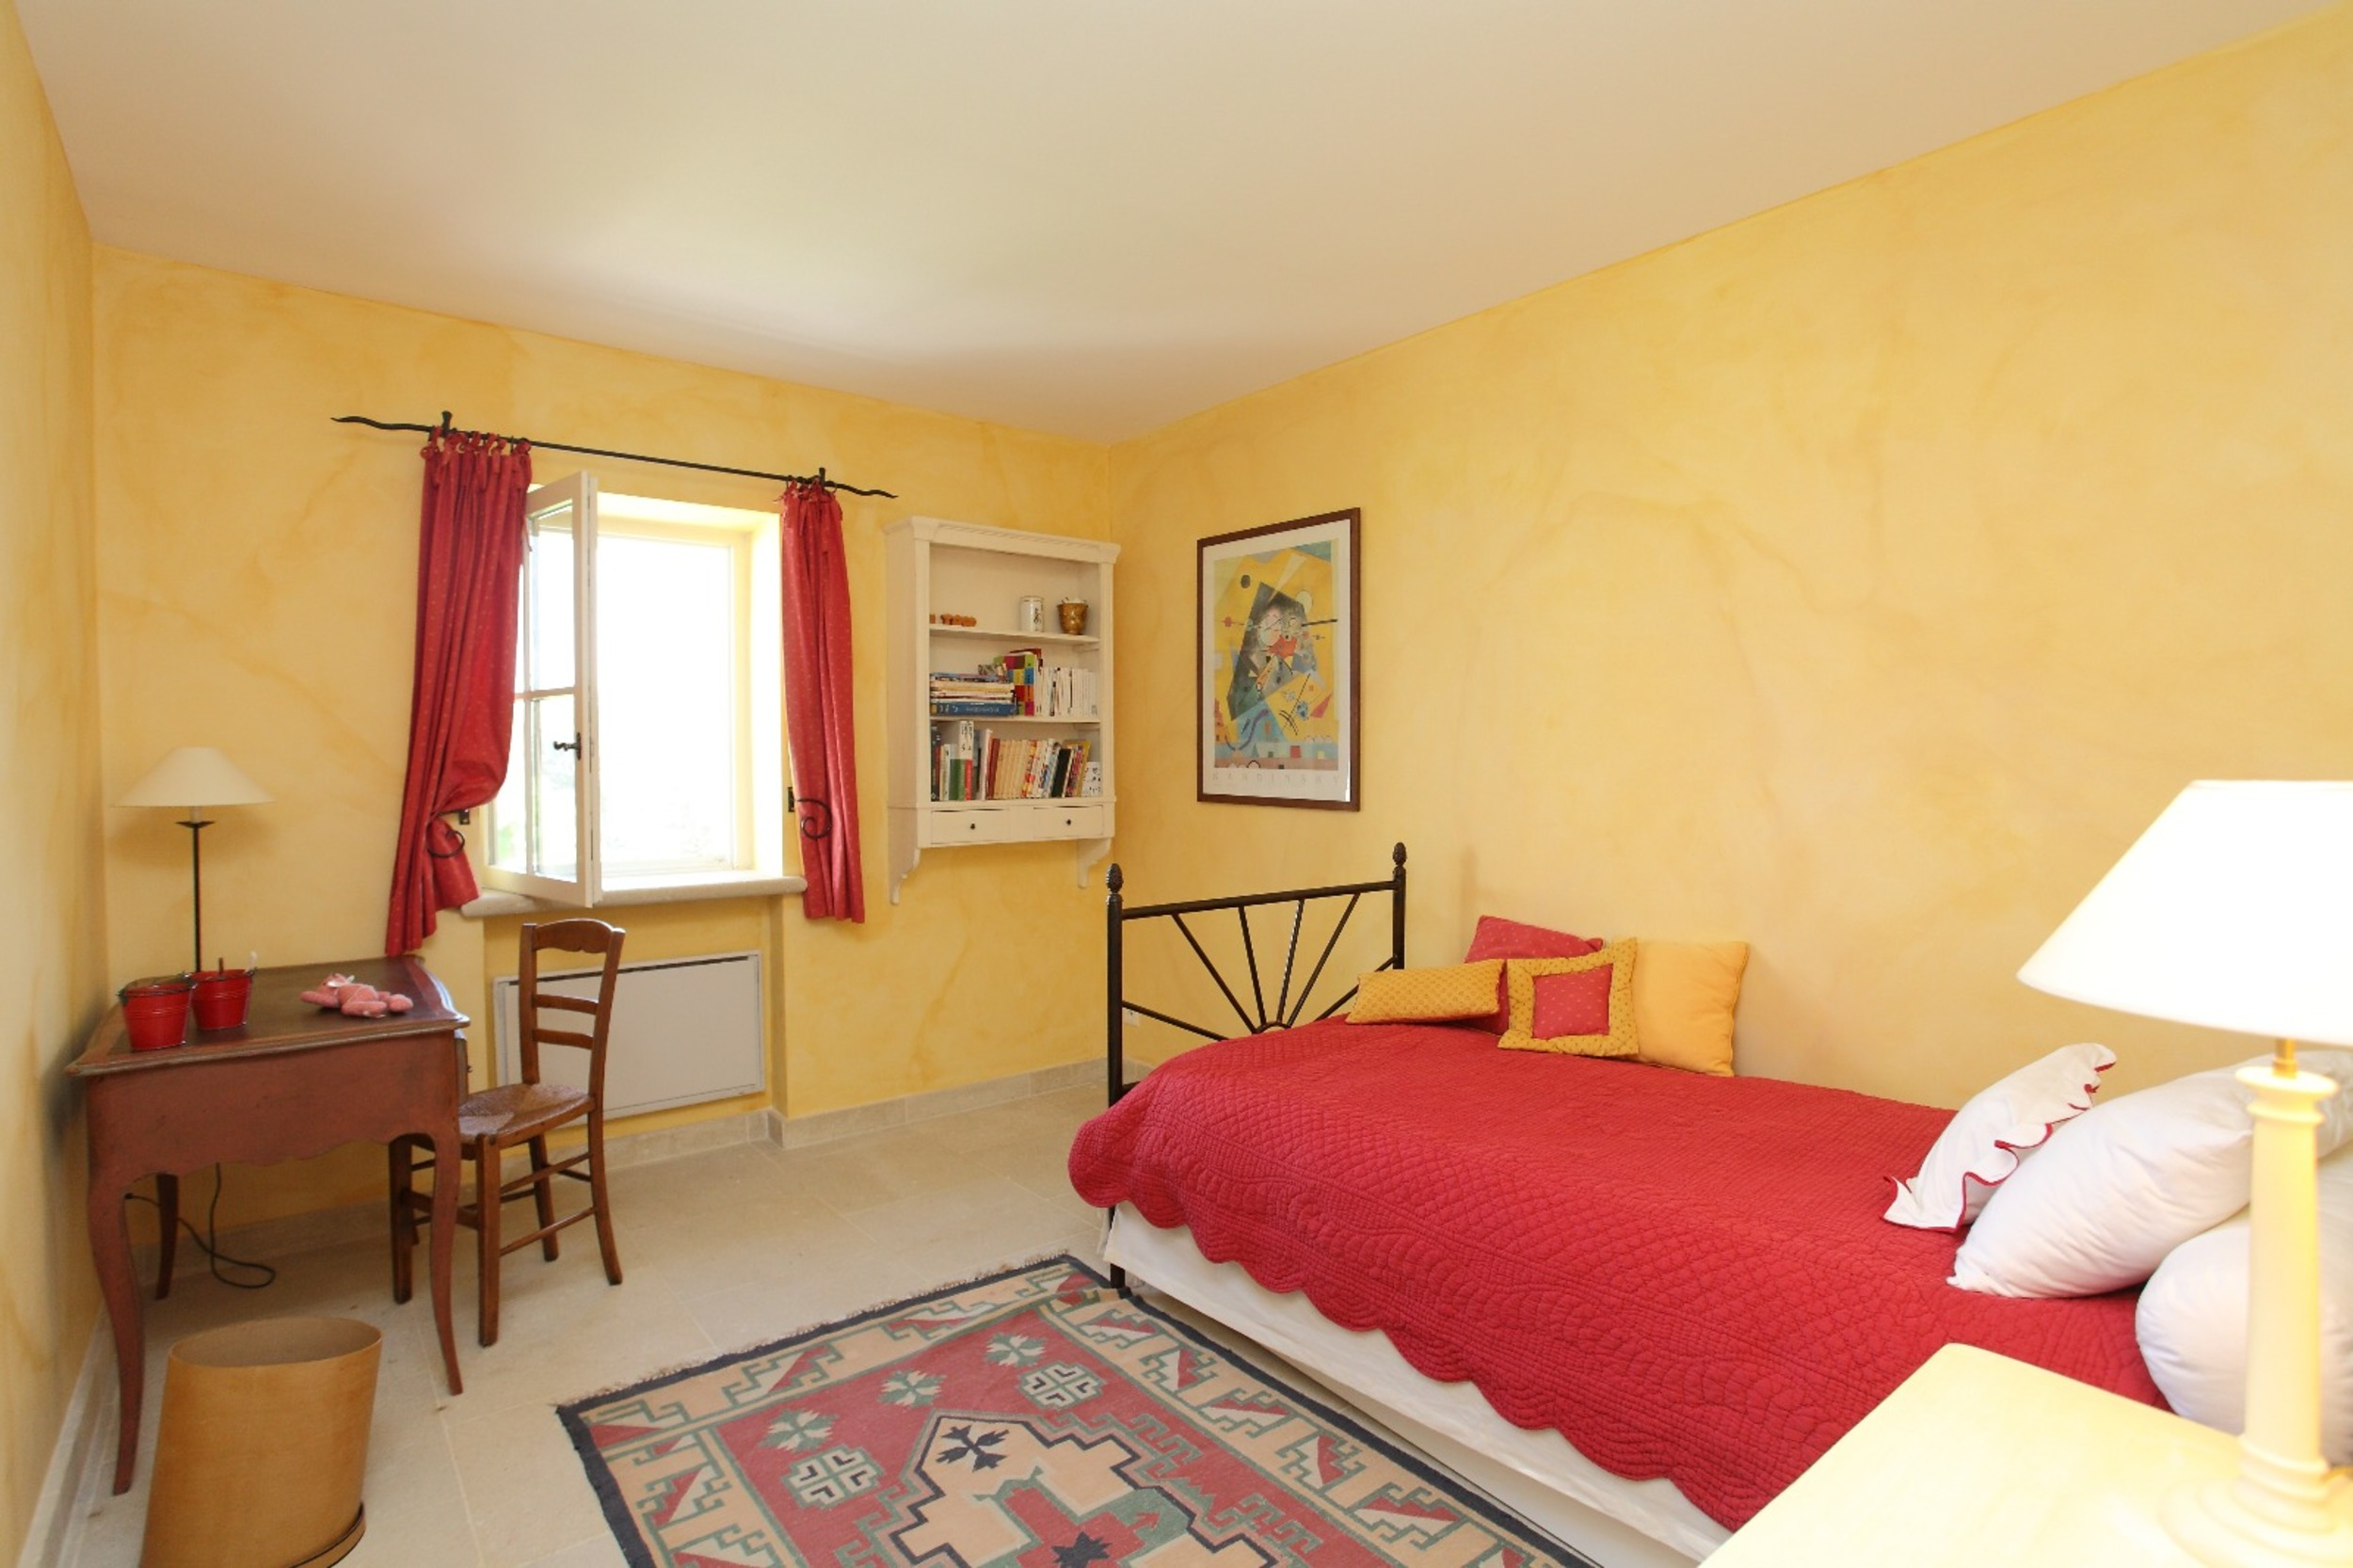 Holiday house Der Fall - Fabelhaftes Landhaus in Gordes (2520443), Gordes, Vaucluse, Provence - Alps - Côte d'Azur, France, picture 23